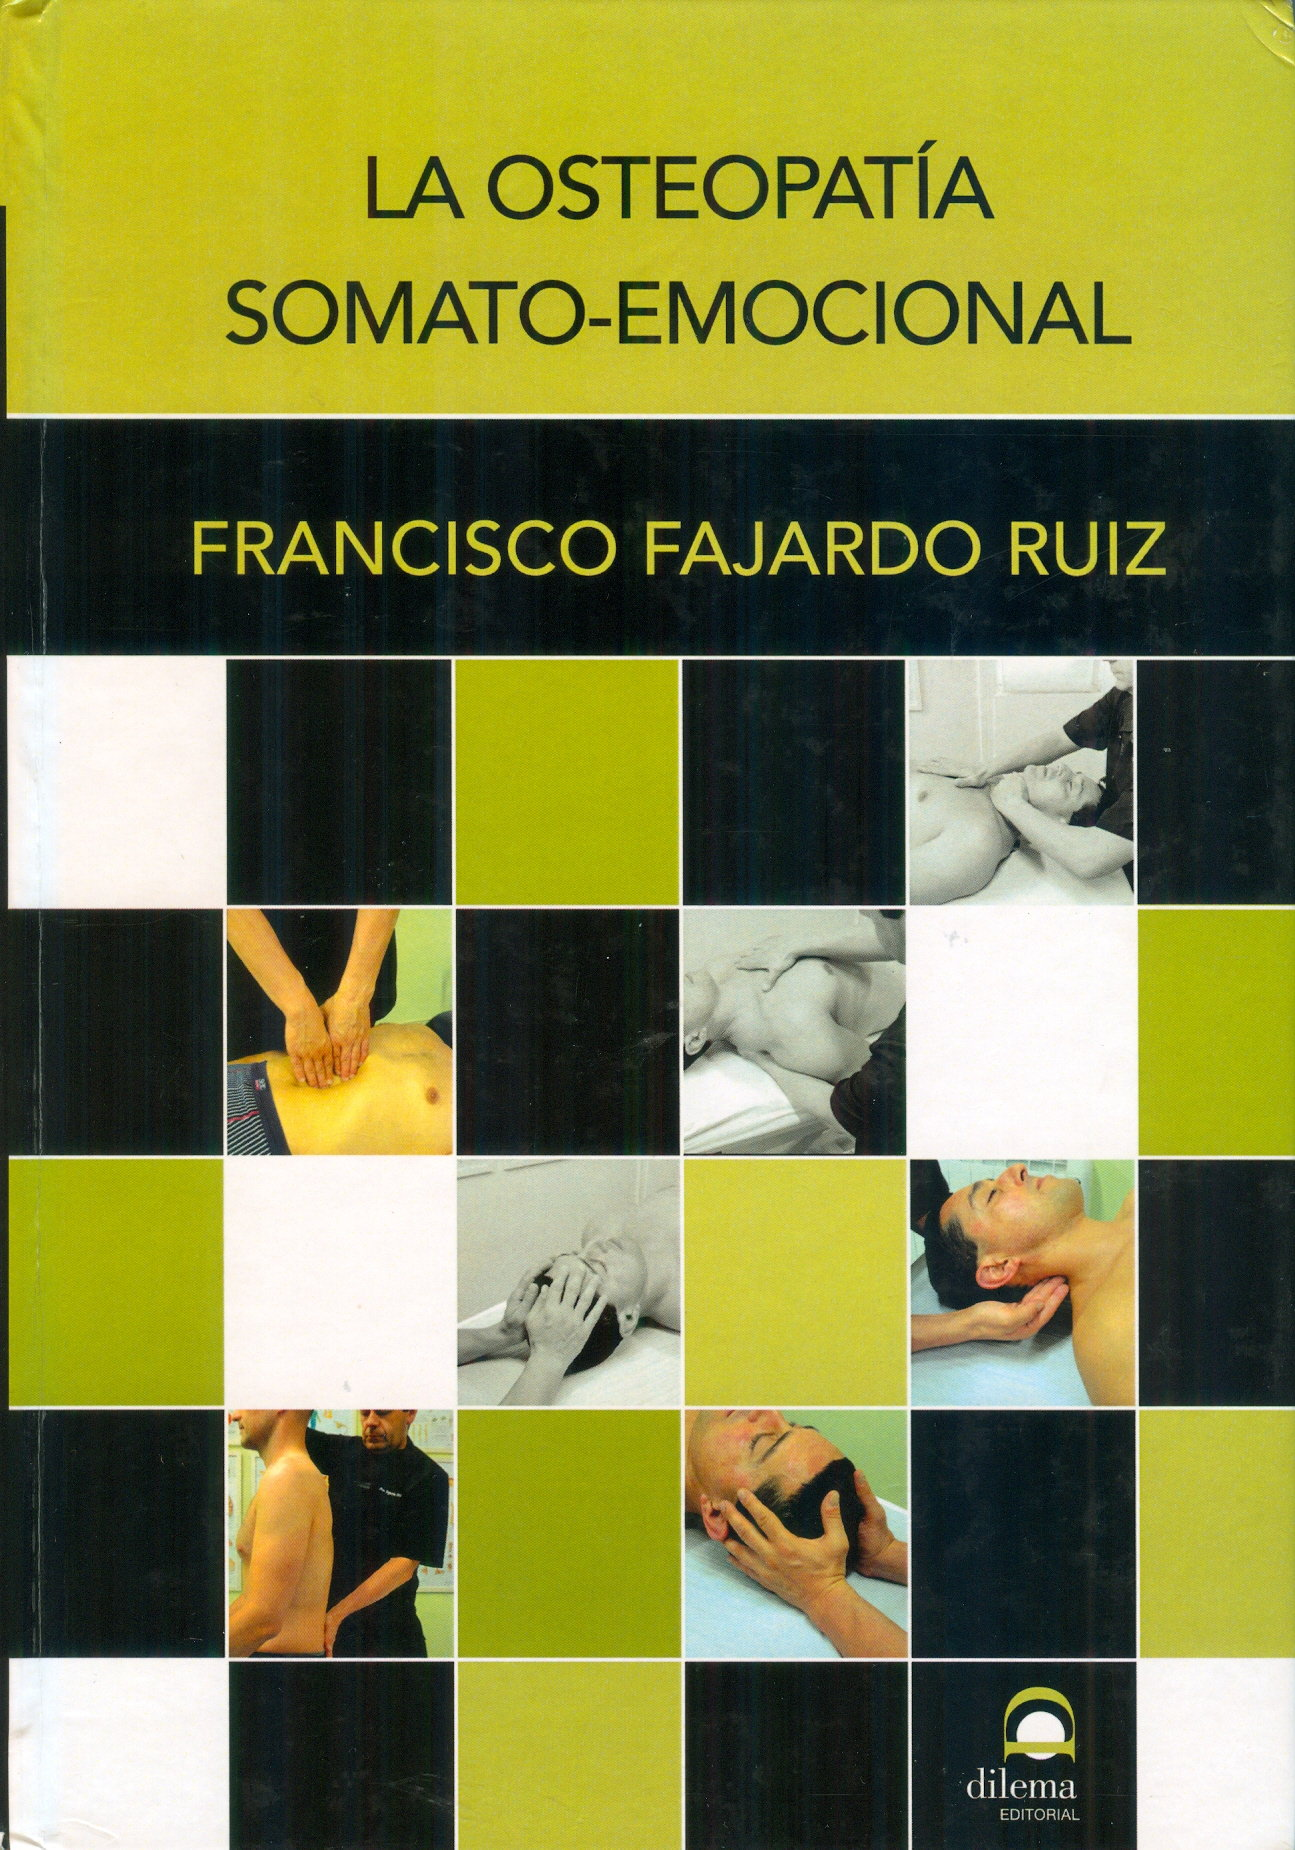 La osteopatía somato-emocional Image